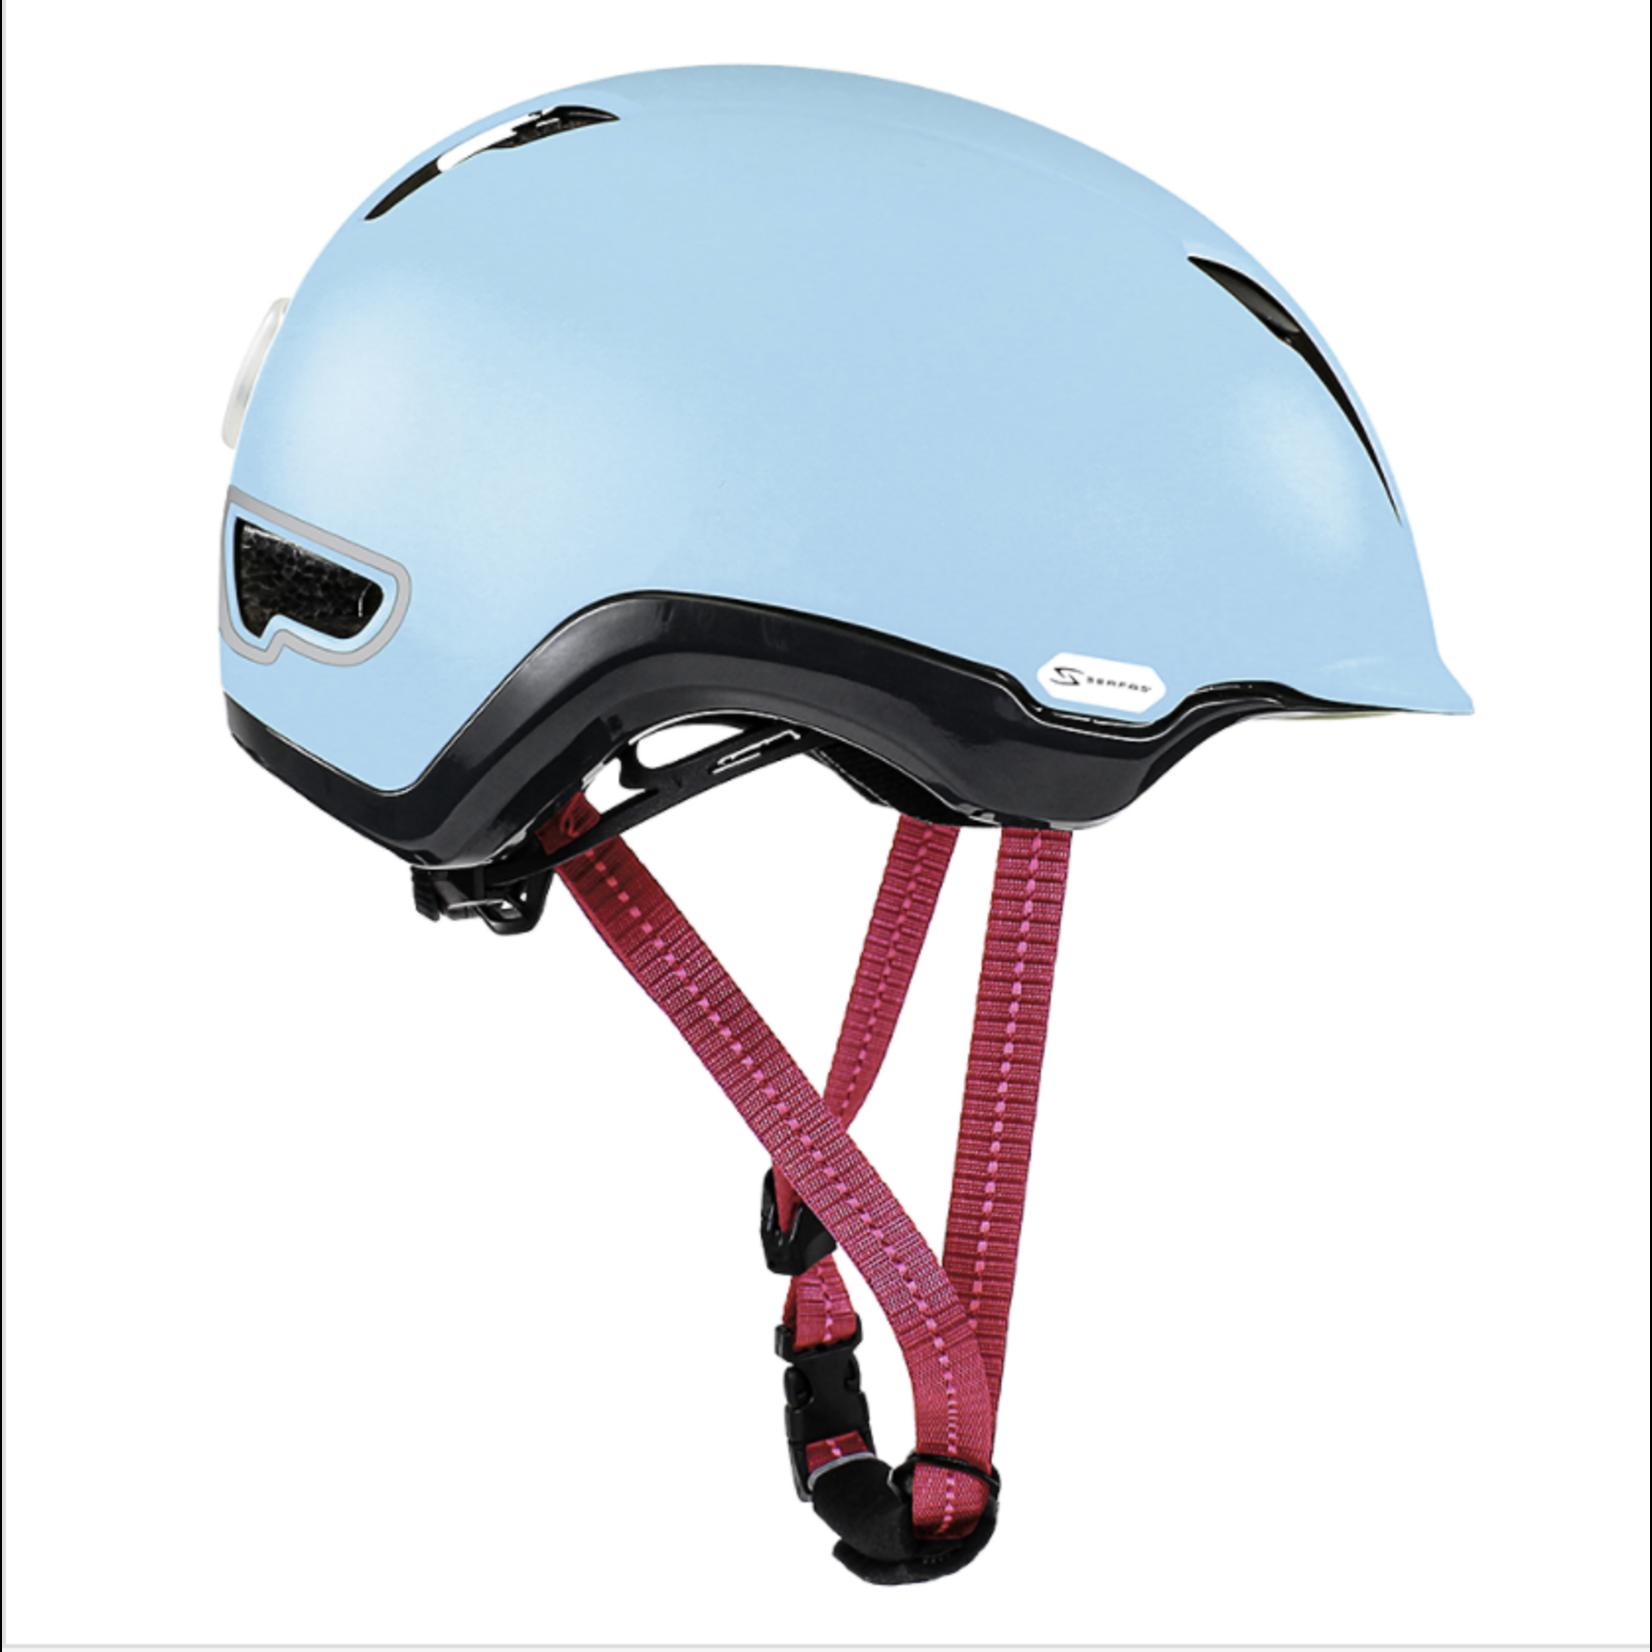 SERFAS Helmet HT-504MTBL Kilowatt E-Bike Matte Sky Blue L/XL (SERFAS)